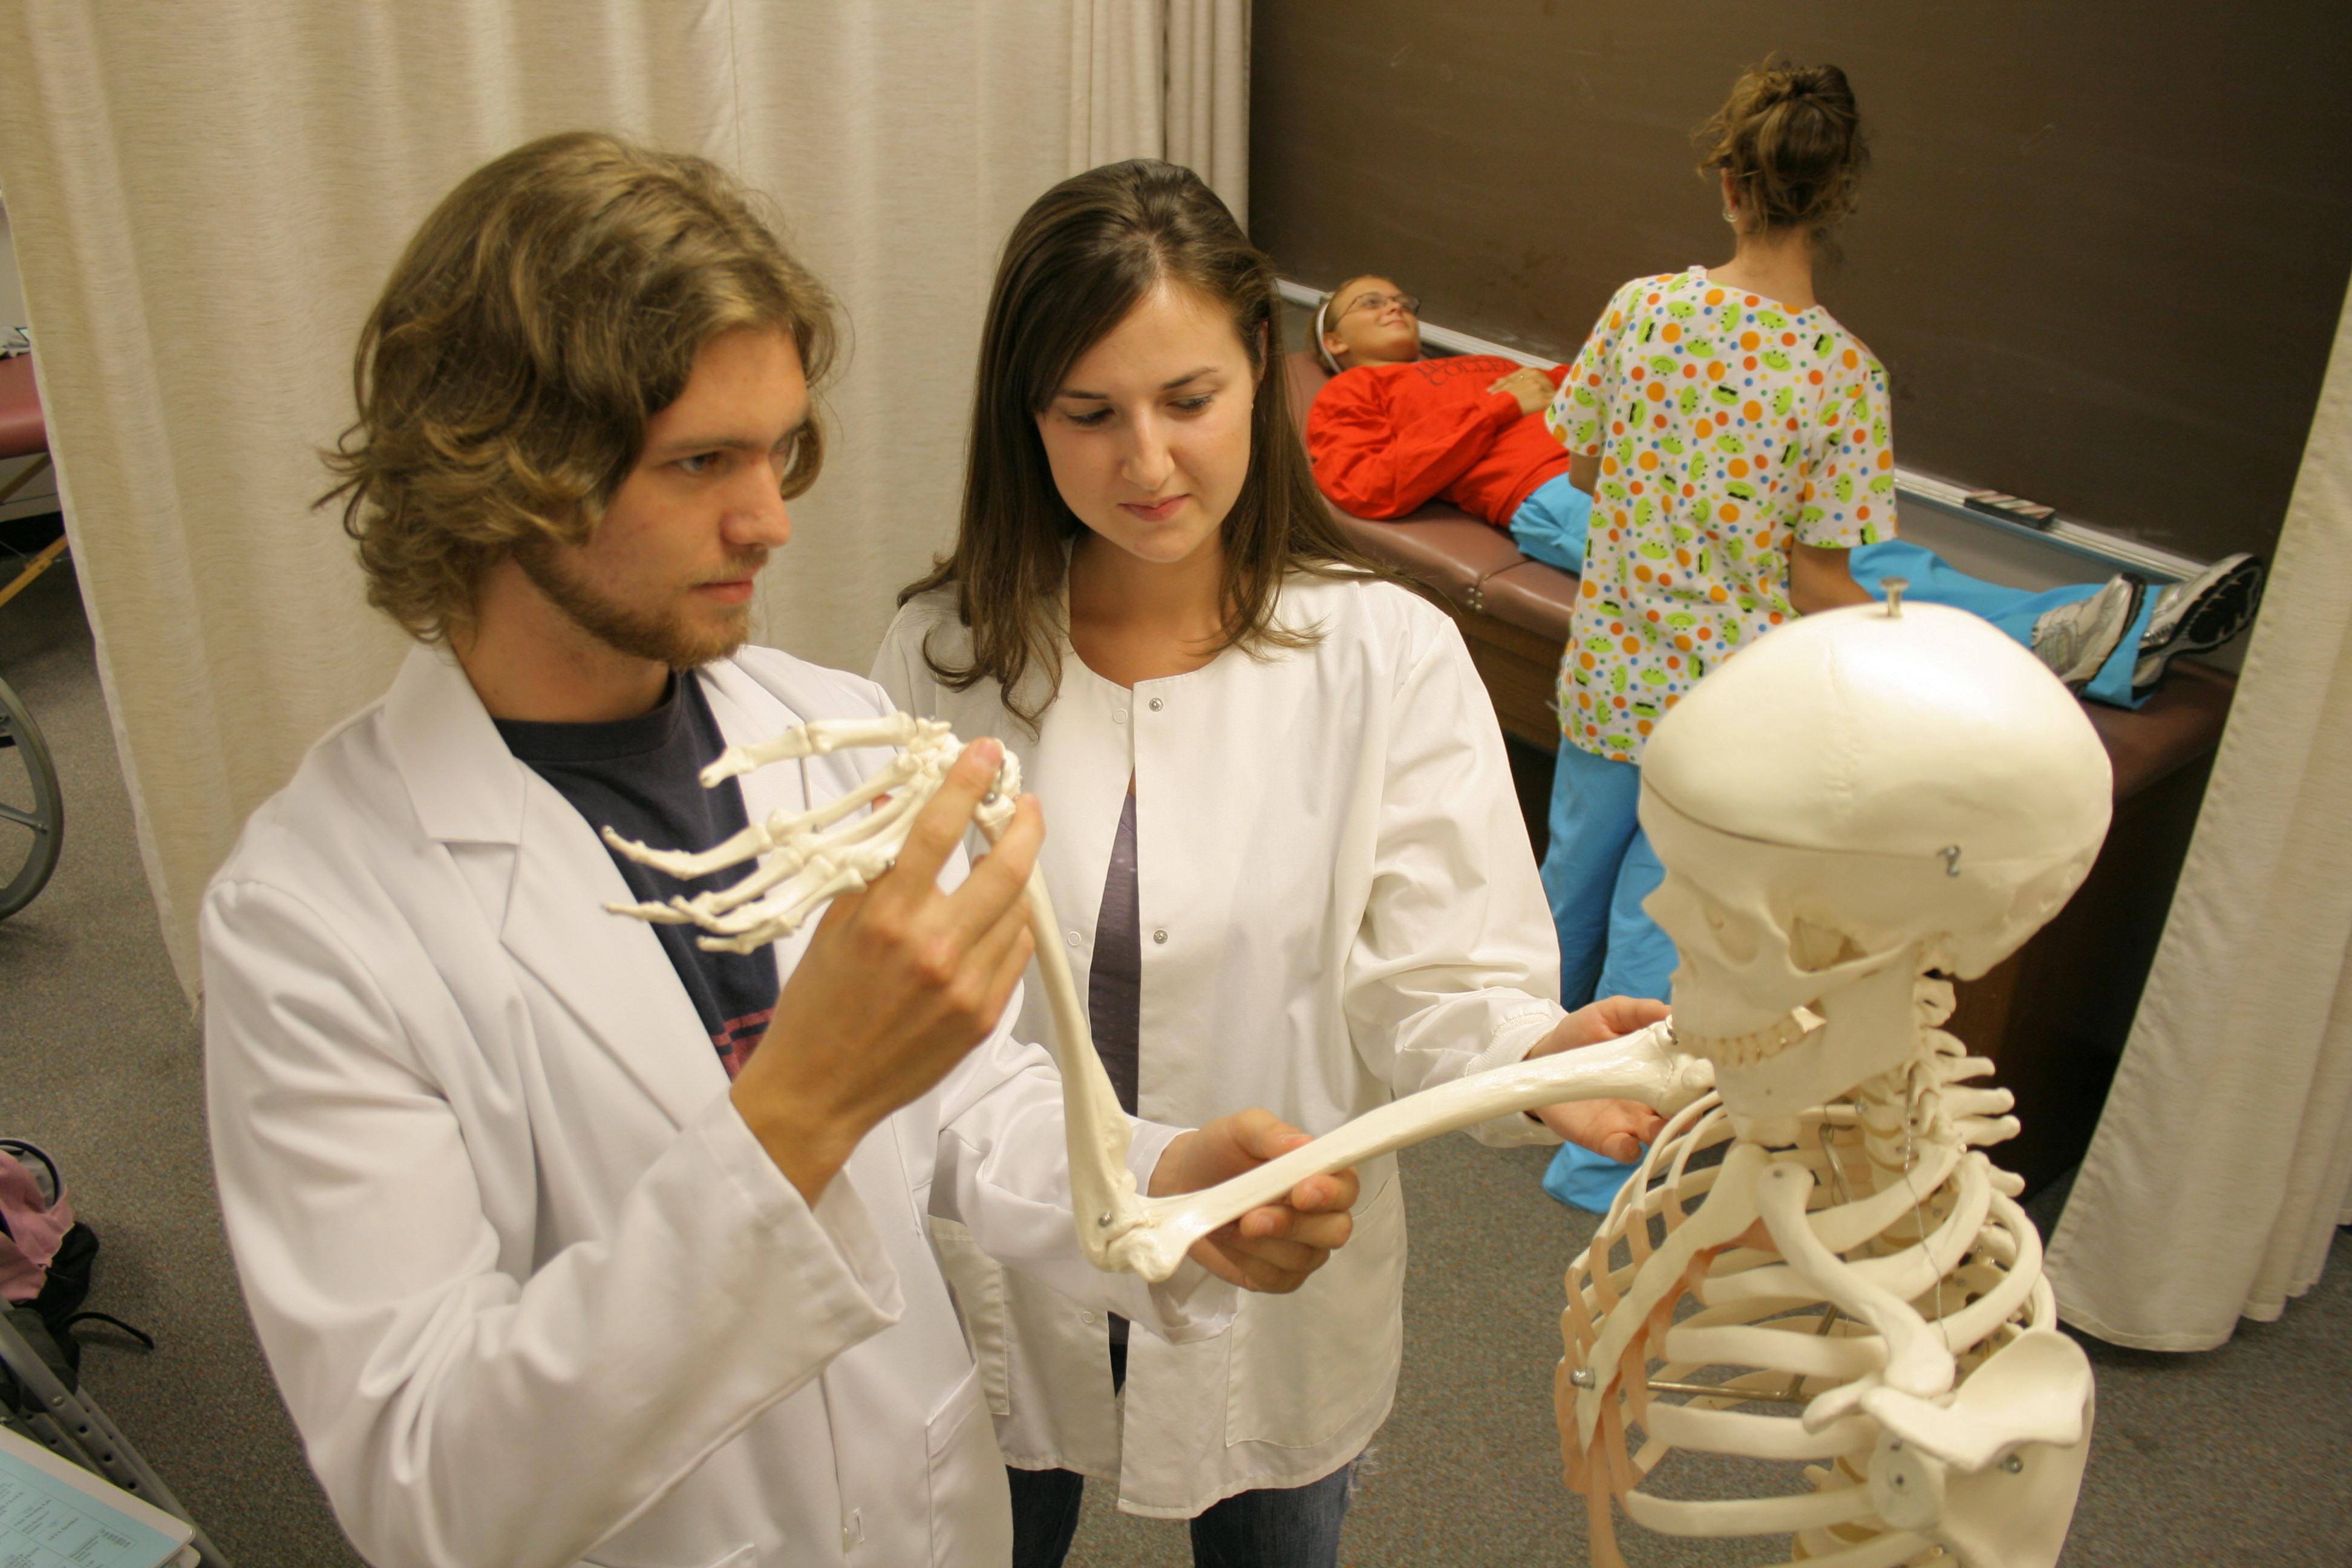 Medical Assistant Degree